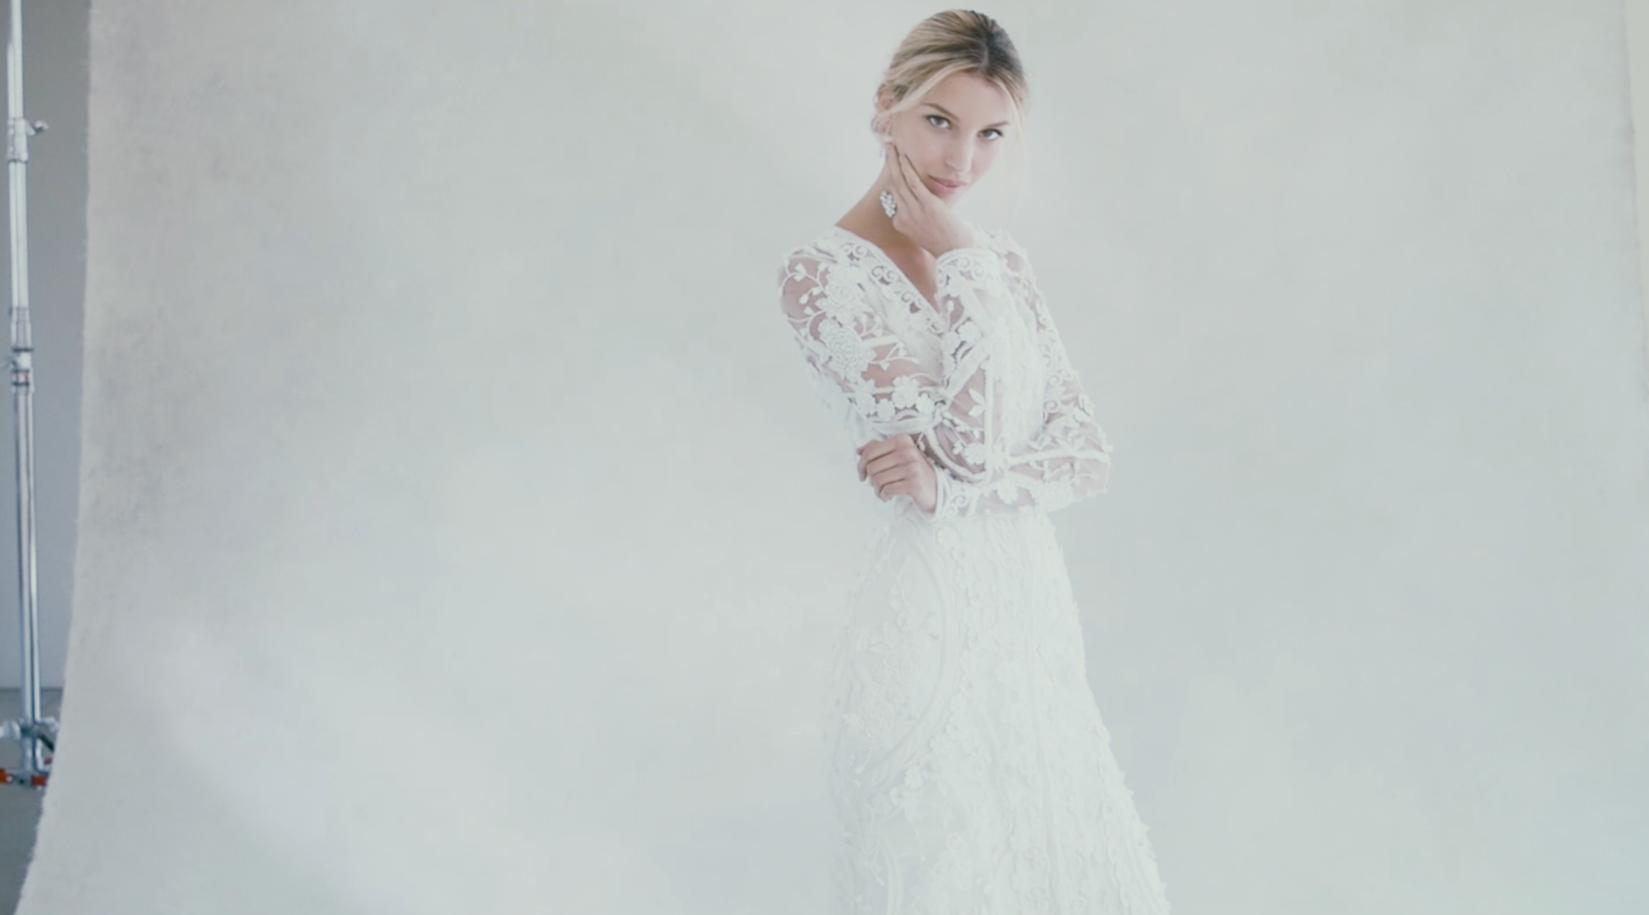 Sneak peek at Oscar de la Renta's Fall 2017 wedding dress collection